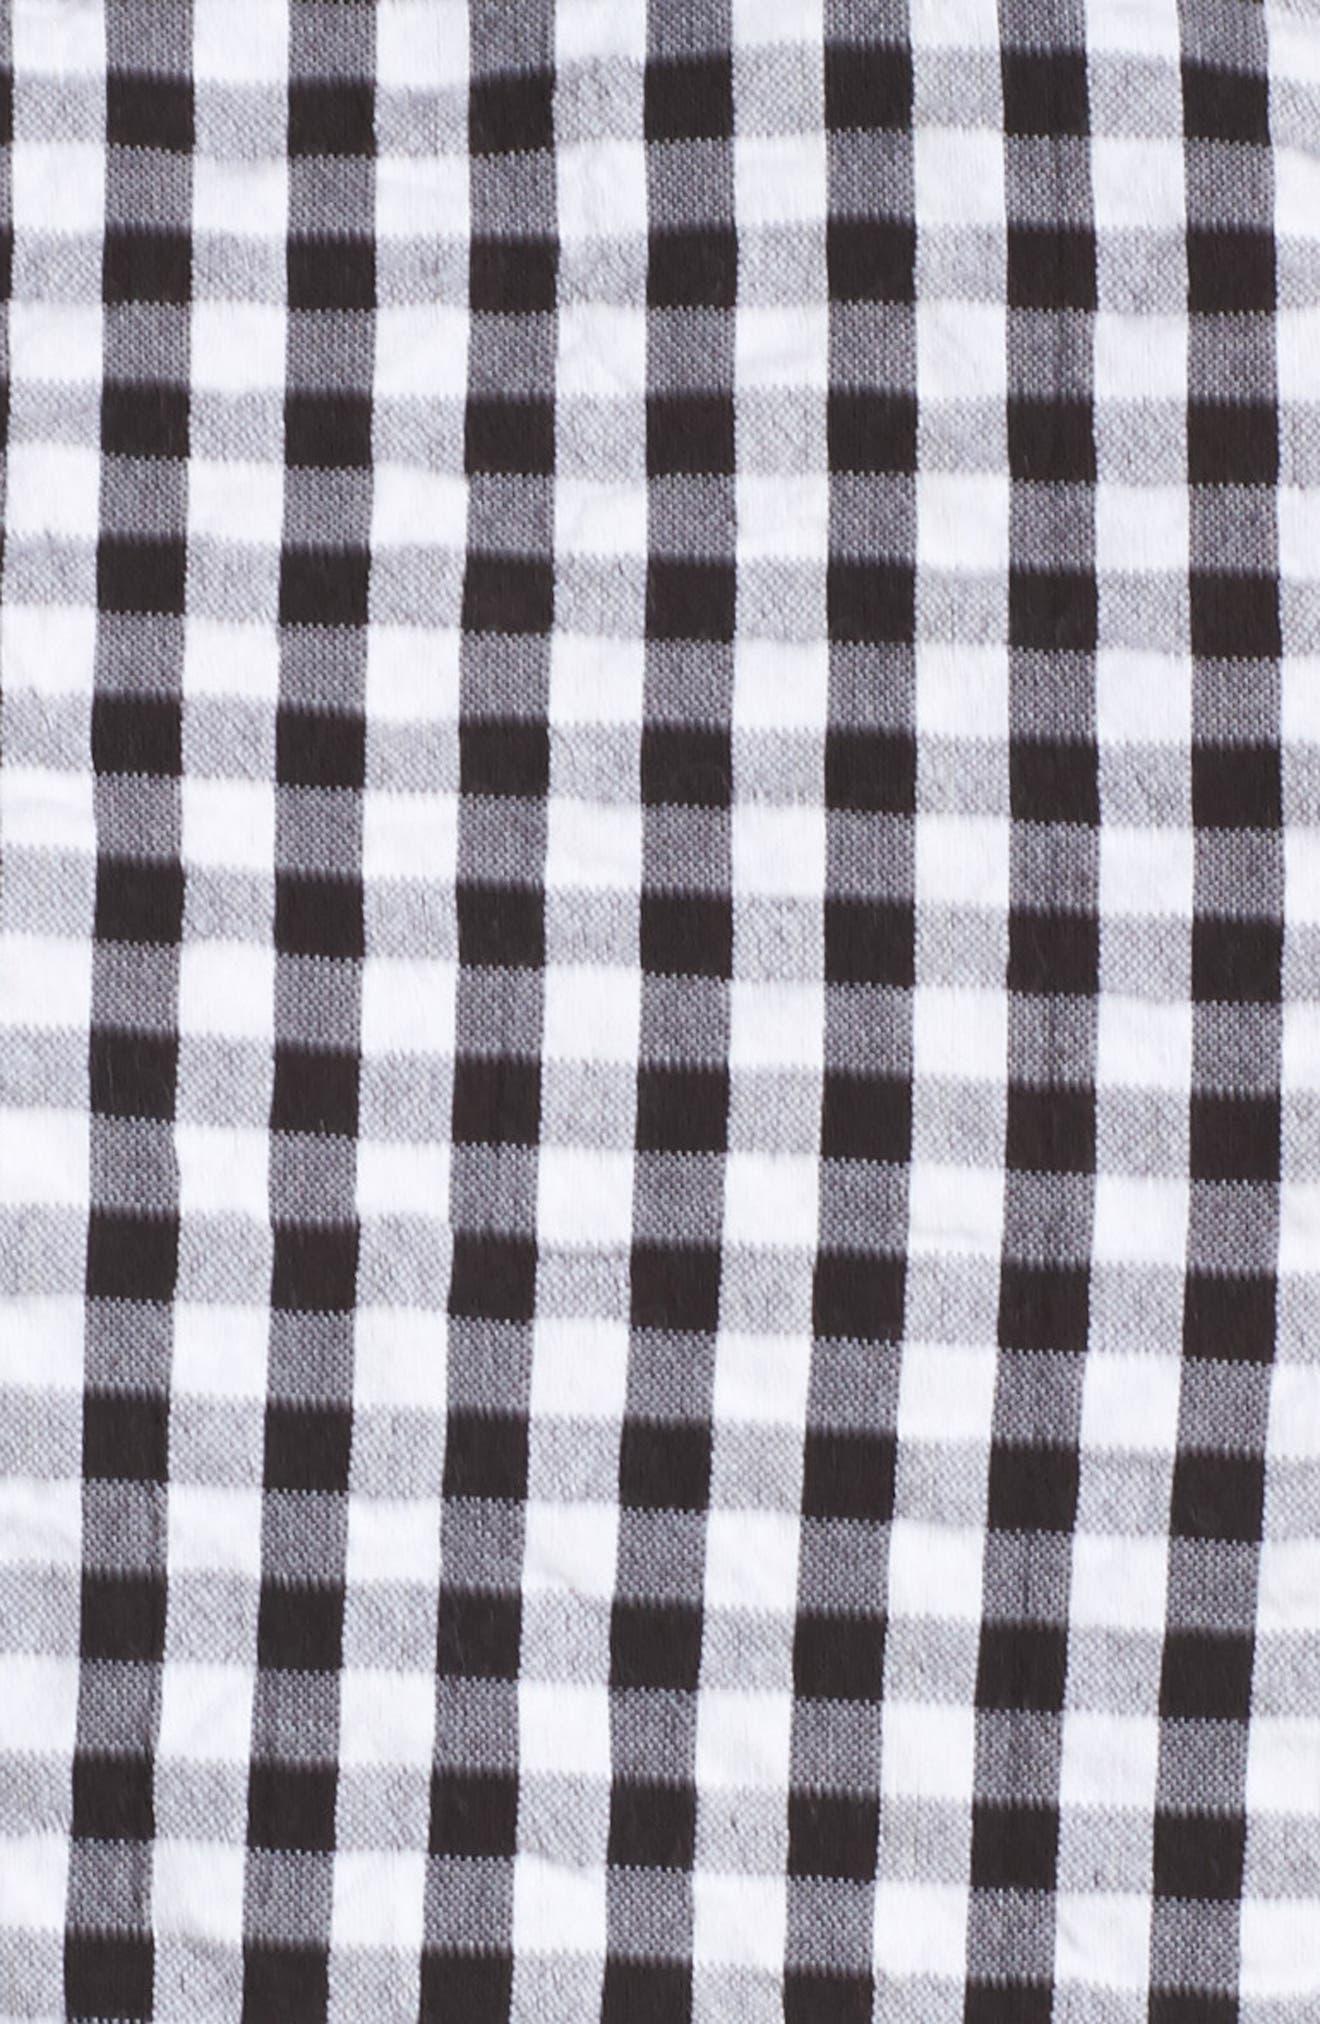 Tassel Tie Neck Tiered Ruffle Tank,                             Alternate thumbnail 6, color,                             Black- White Gingham